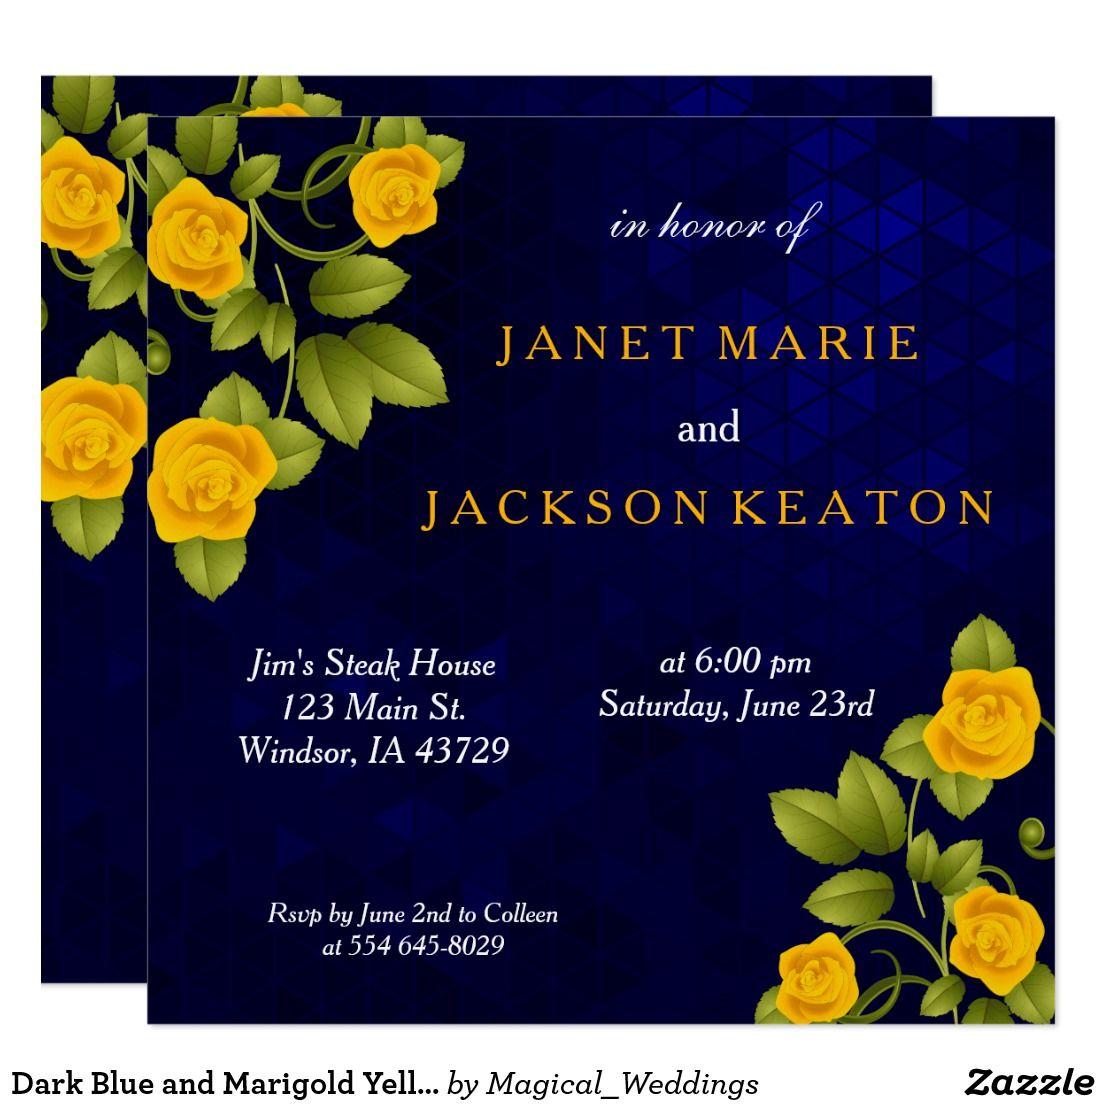 Marigold Yellow Rose Flower